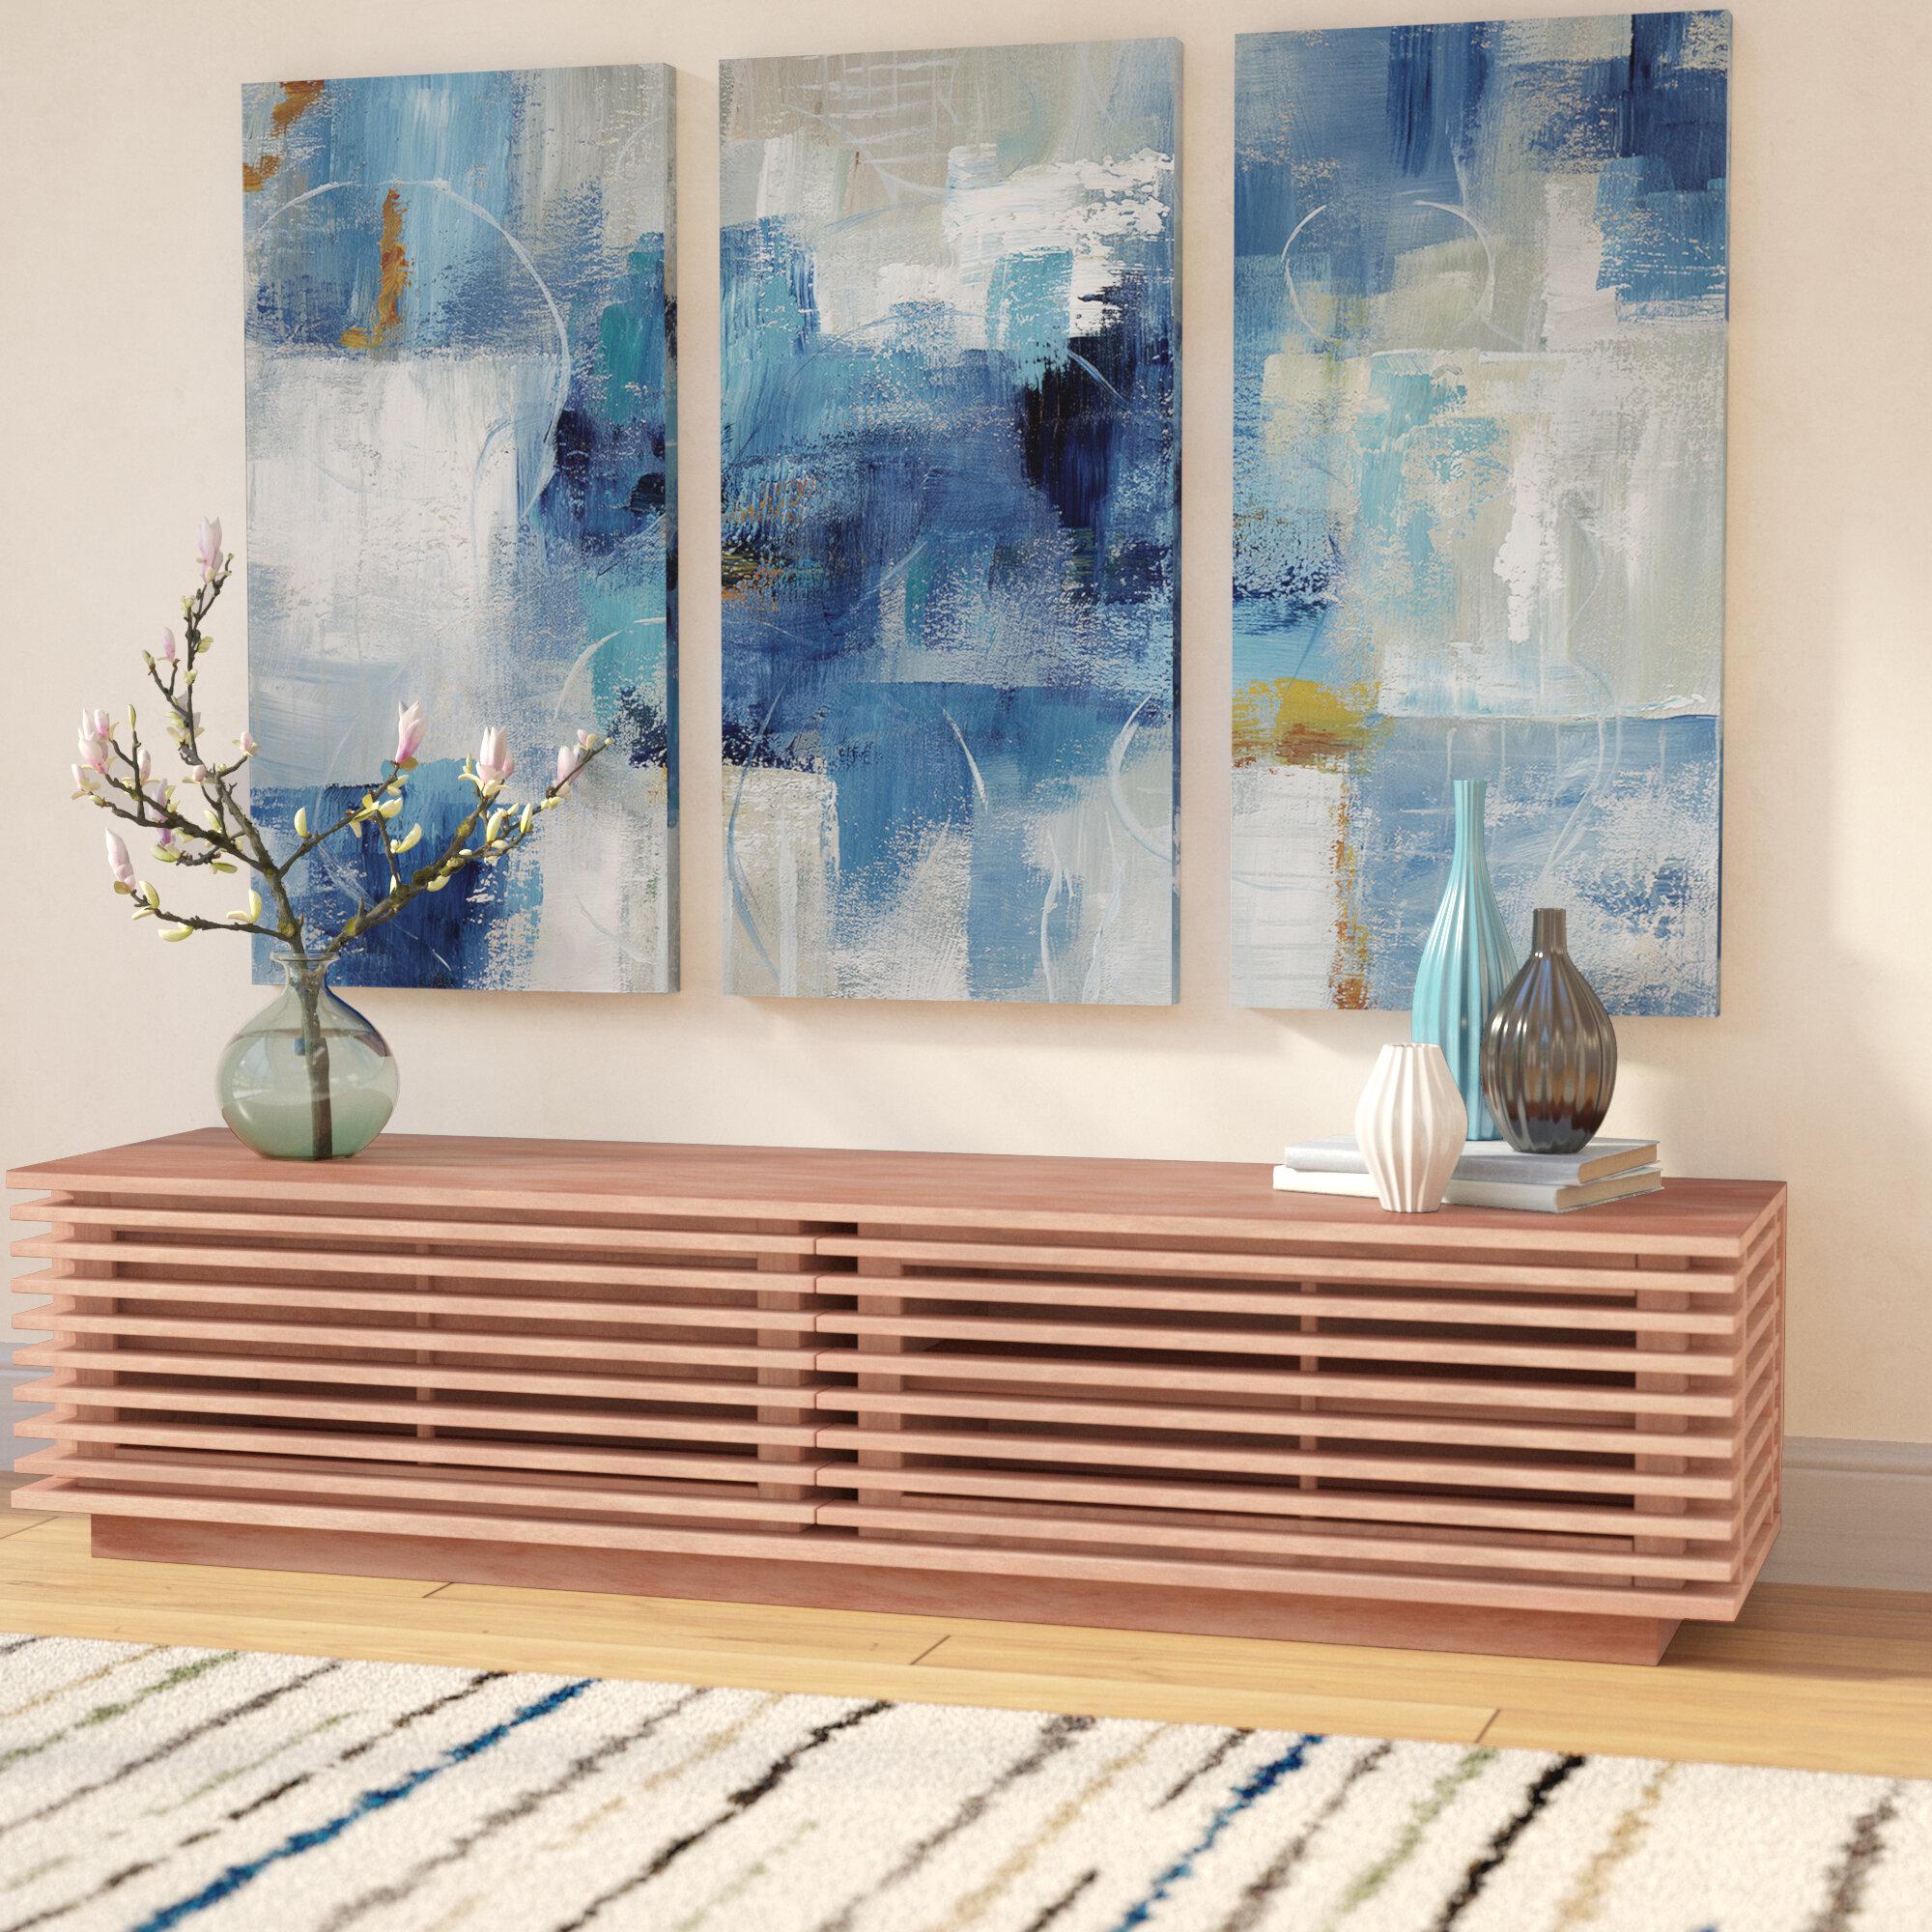 Wall Art Sale Up To 60 Off Through 12 26 Wayfair